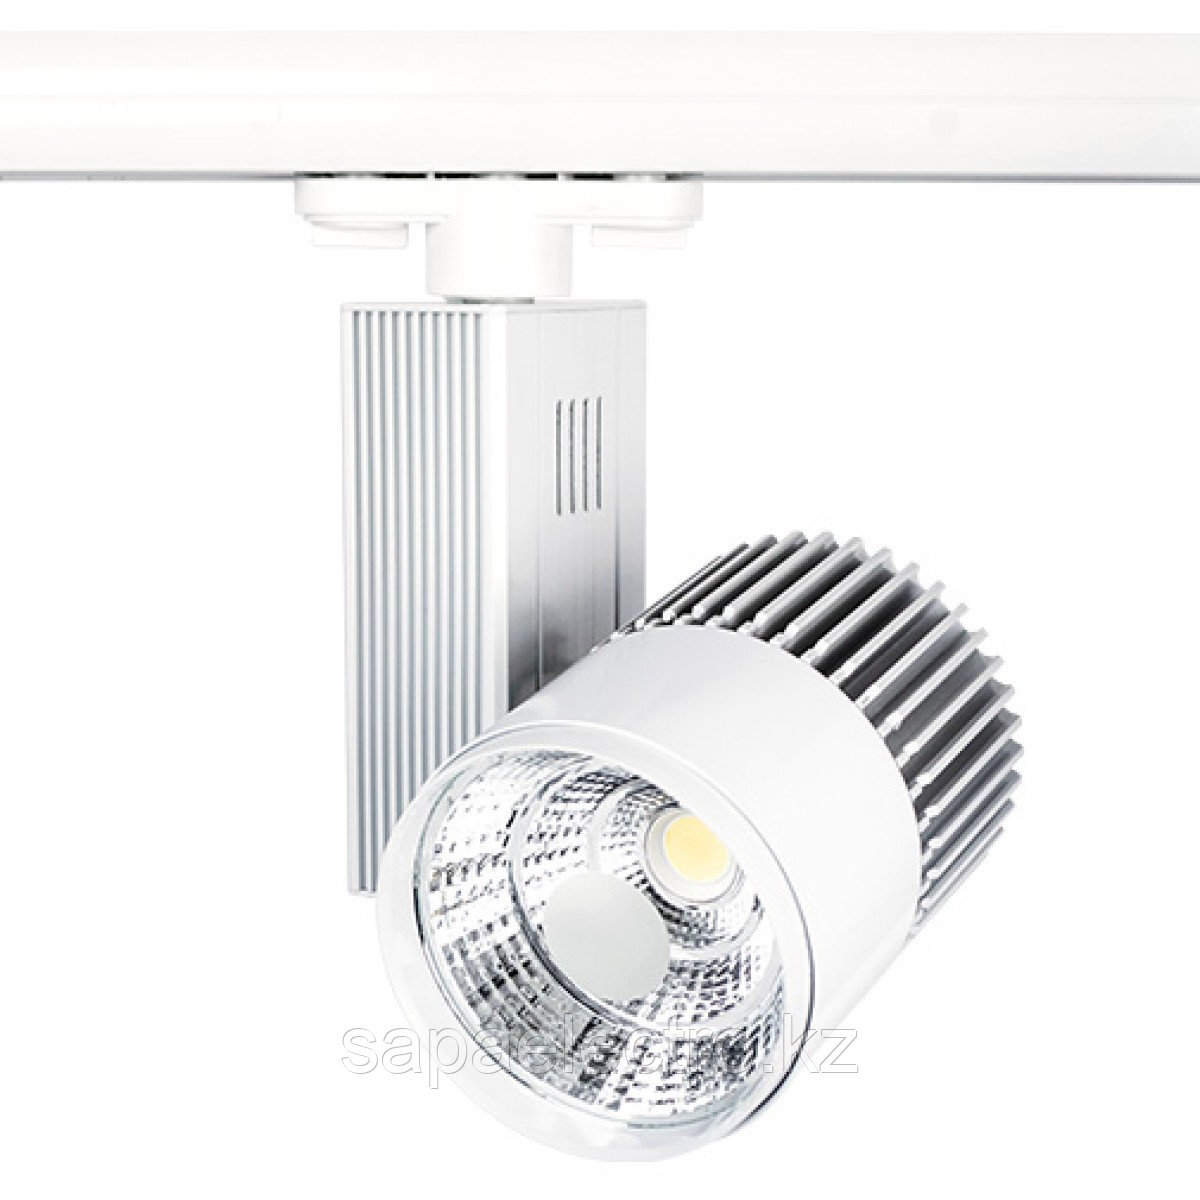 Св-к. LED HZG-H096 30W 5700K WHITE TRACK (TS)16шт